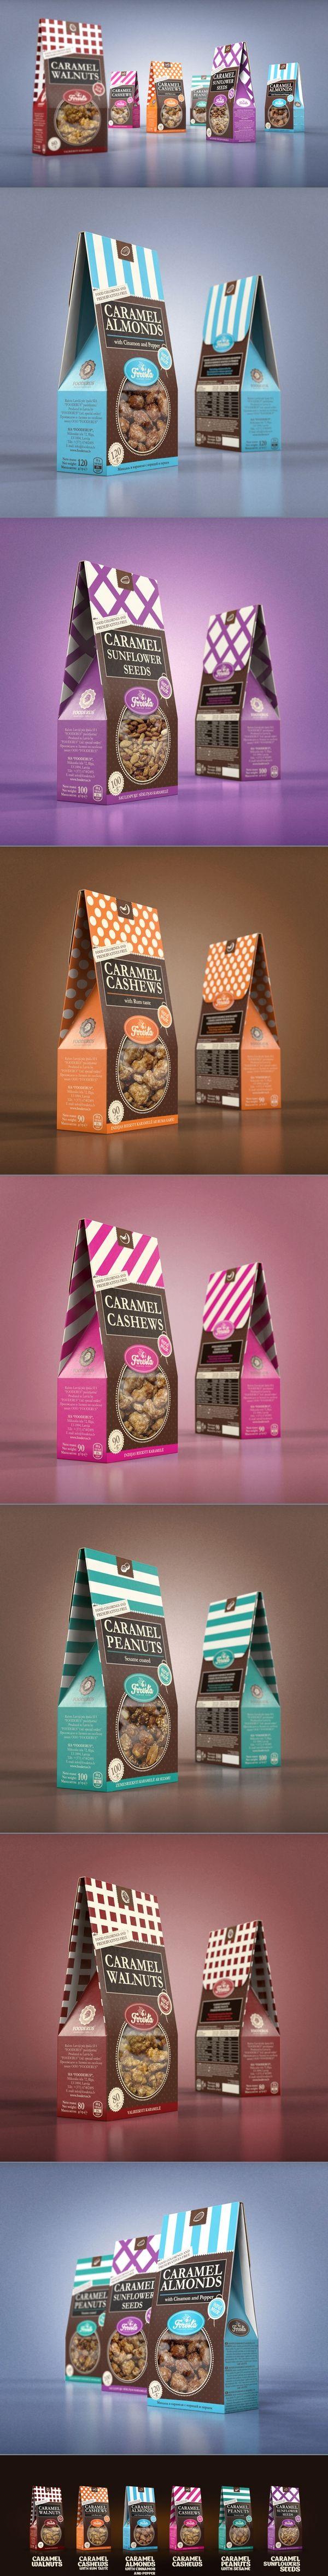 Sugar nuts :  Packaging design by Studio43.  Source : http://www.behance.net/gallery/Nuts-packaging/3502503